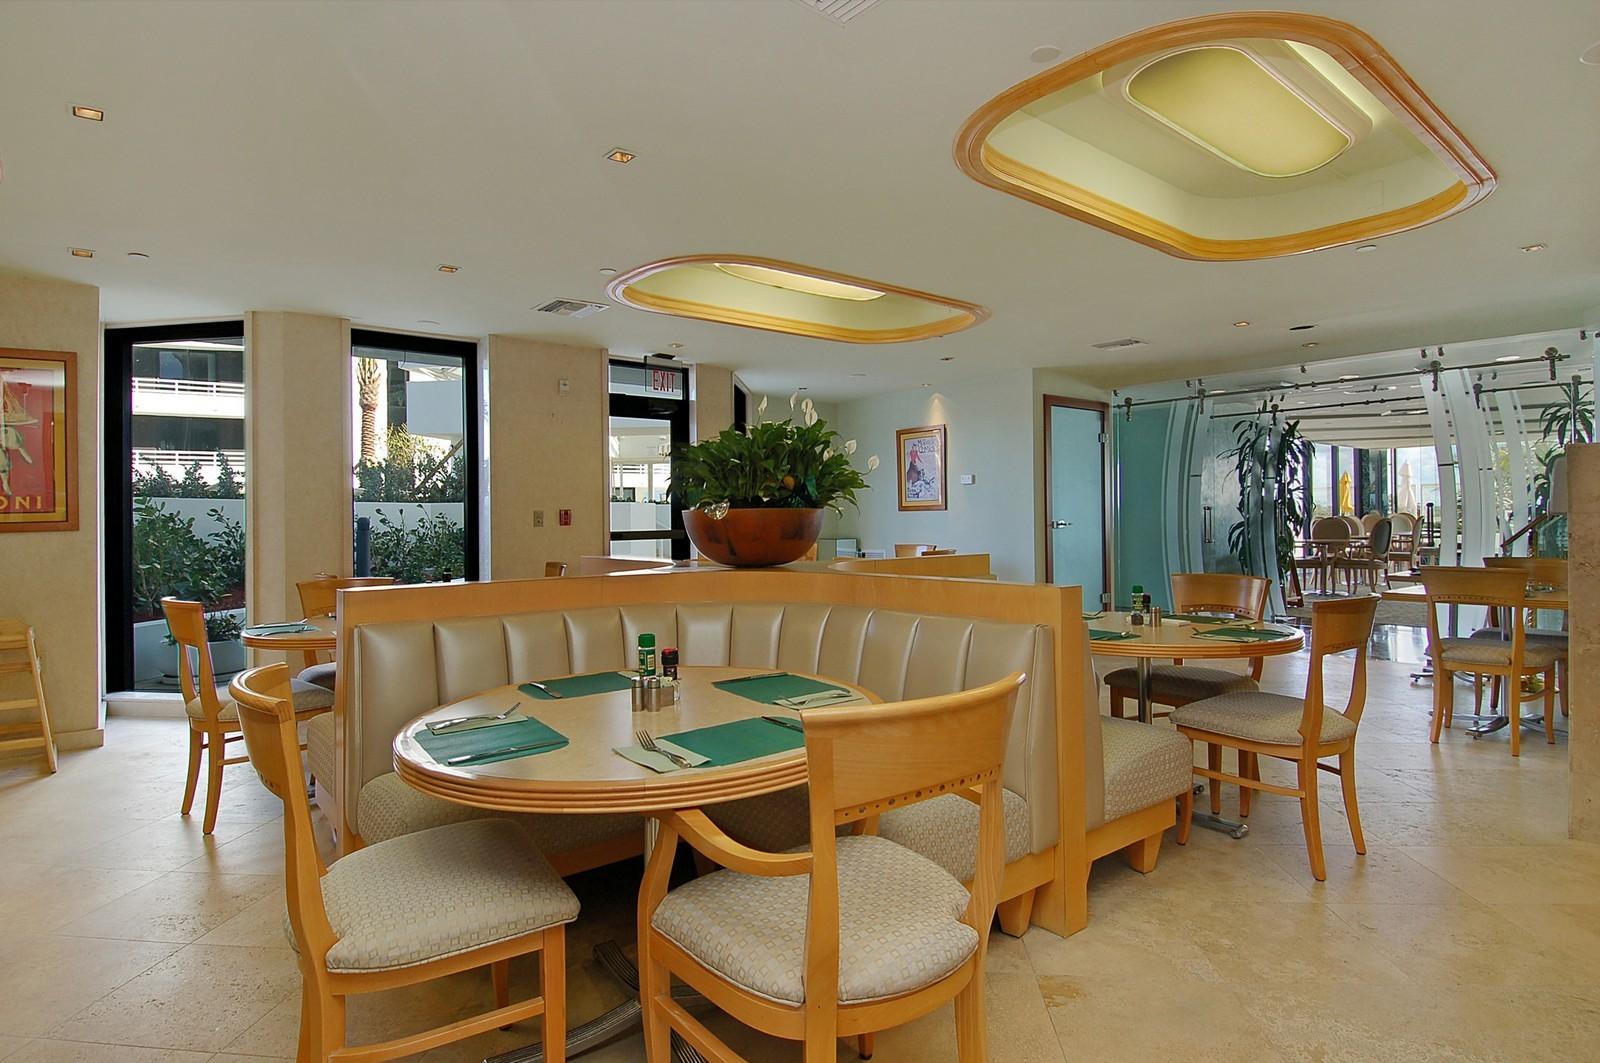 Real Estate Photography - 1500 S Ocean, Unit S-1101, Boca Raton, FL, 33432 - Location 11